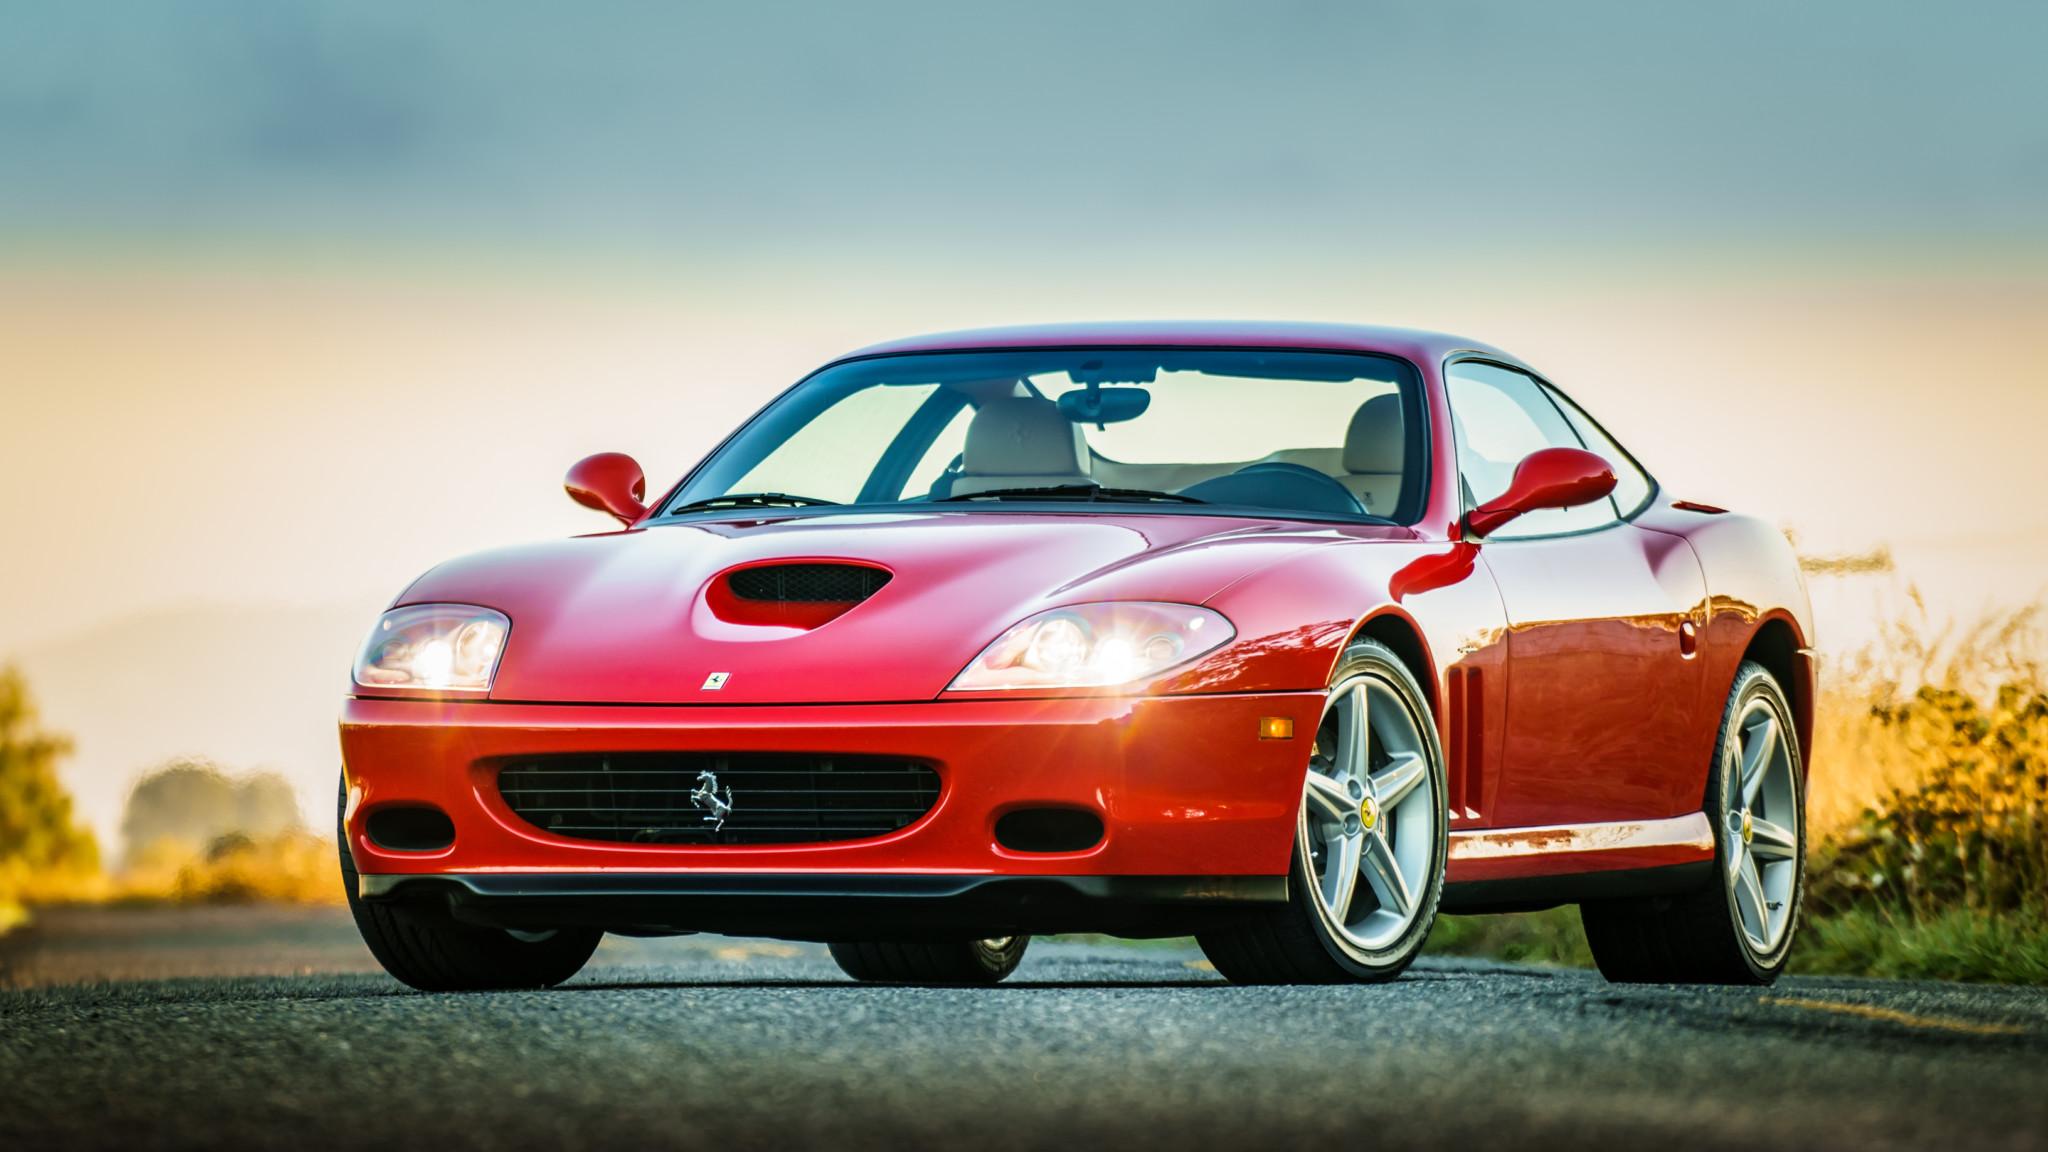 2003 Ferrari 575m Maranello Hd Wallpaper Background Image 2048x1152 Id 1017194 Wallpaper Abyss